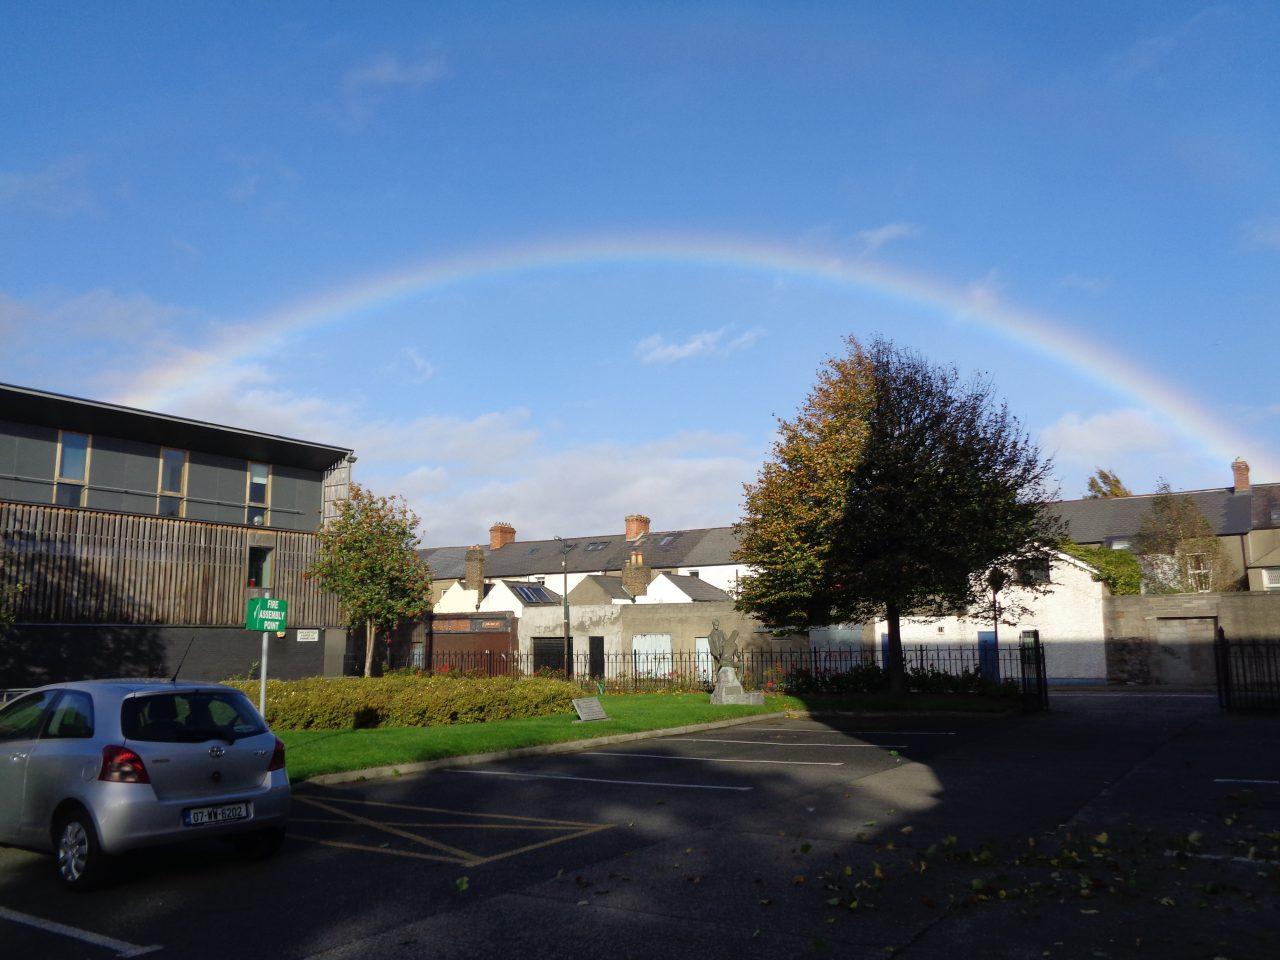 Rainbow at St. Teresa's Church